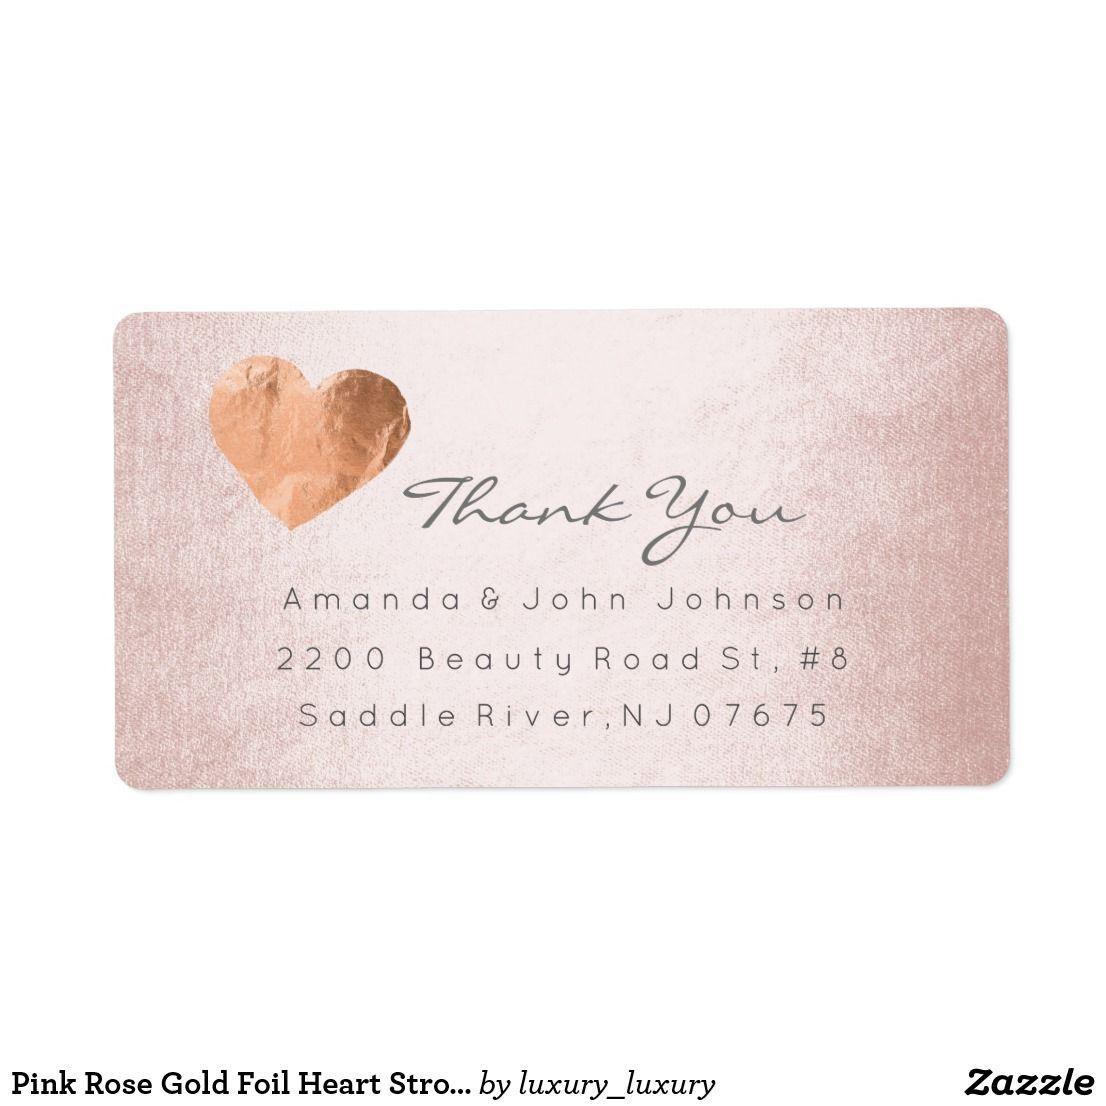 Pink Rose Gold Foil Heart Stroke Thank You Label Zazzle Com Rose Gold Foil Thank You Labels Pink Rose